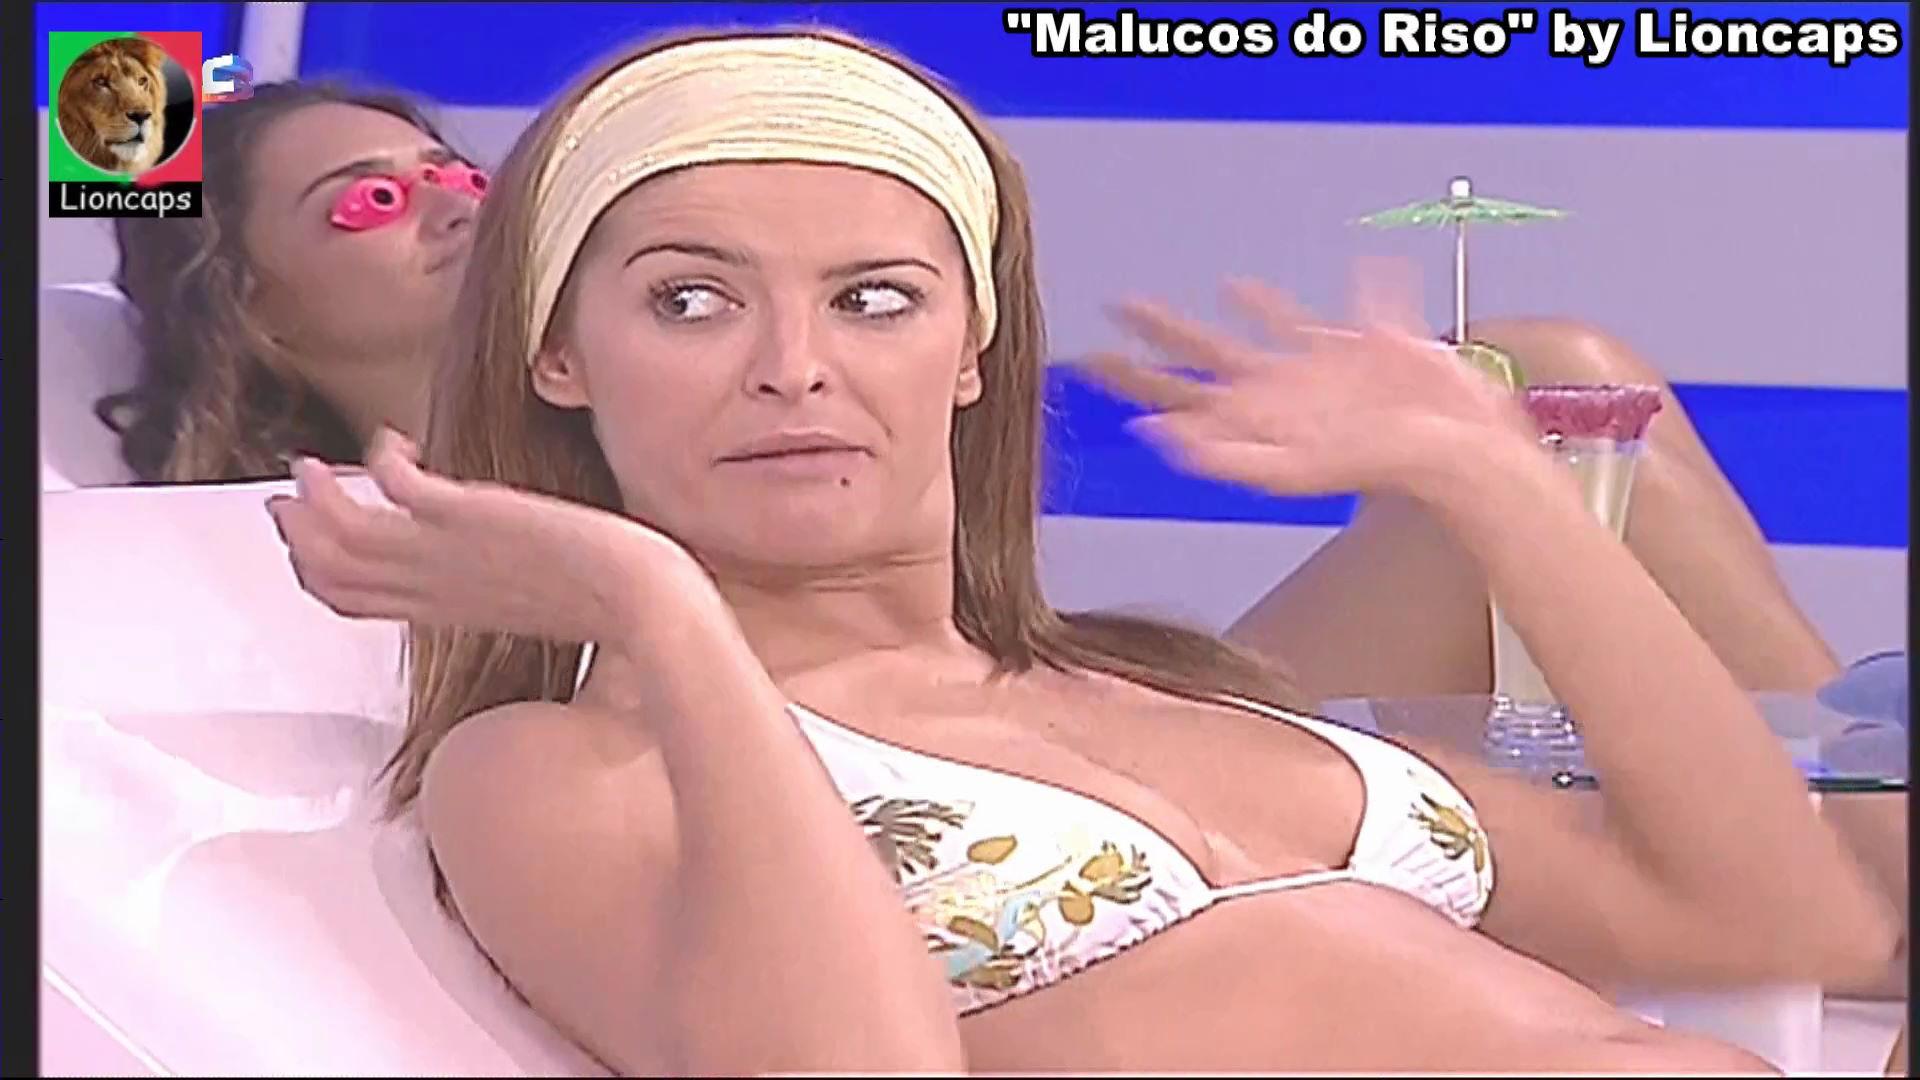 947520057_malucos_riso_alda_gomes_vs190malucos_riso_602_15095_122_577lo.JPG